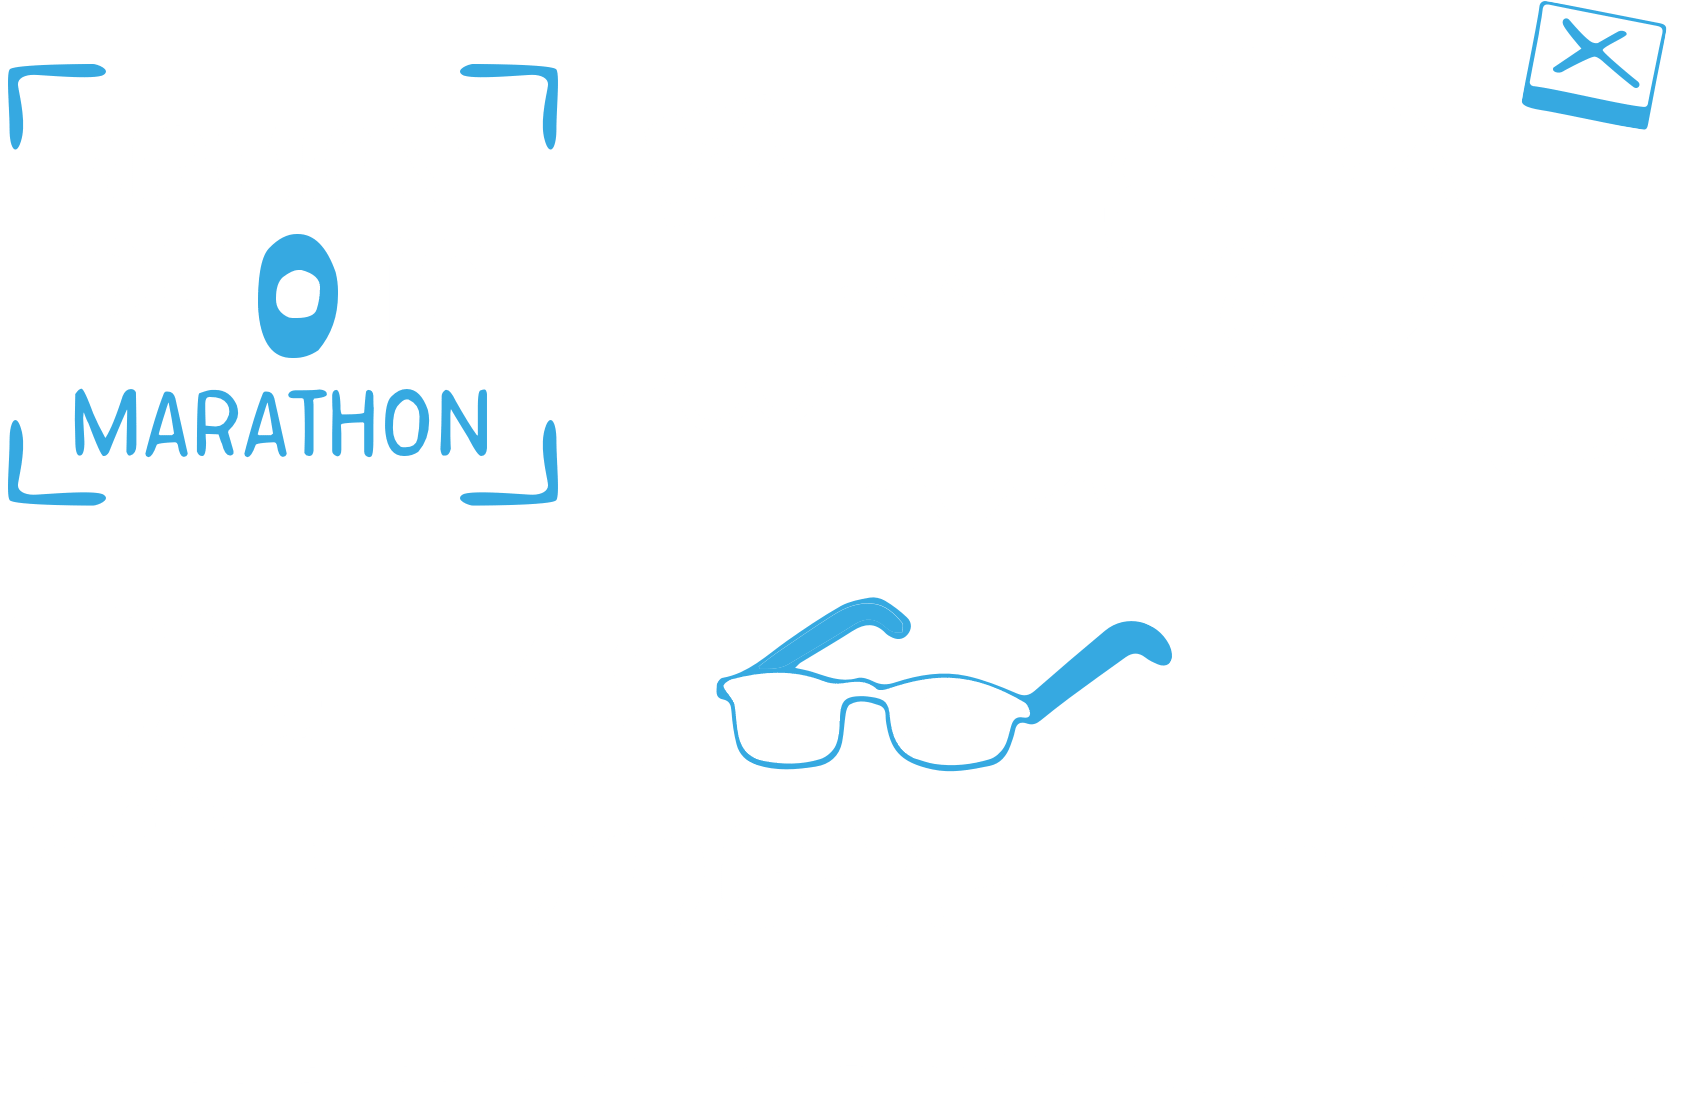 sirmione photo marathon 522 foto 150 fotografi